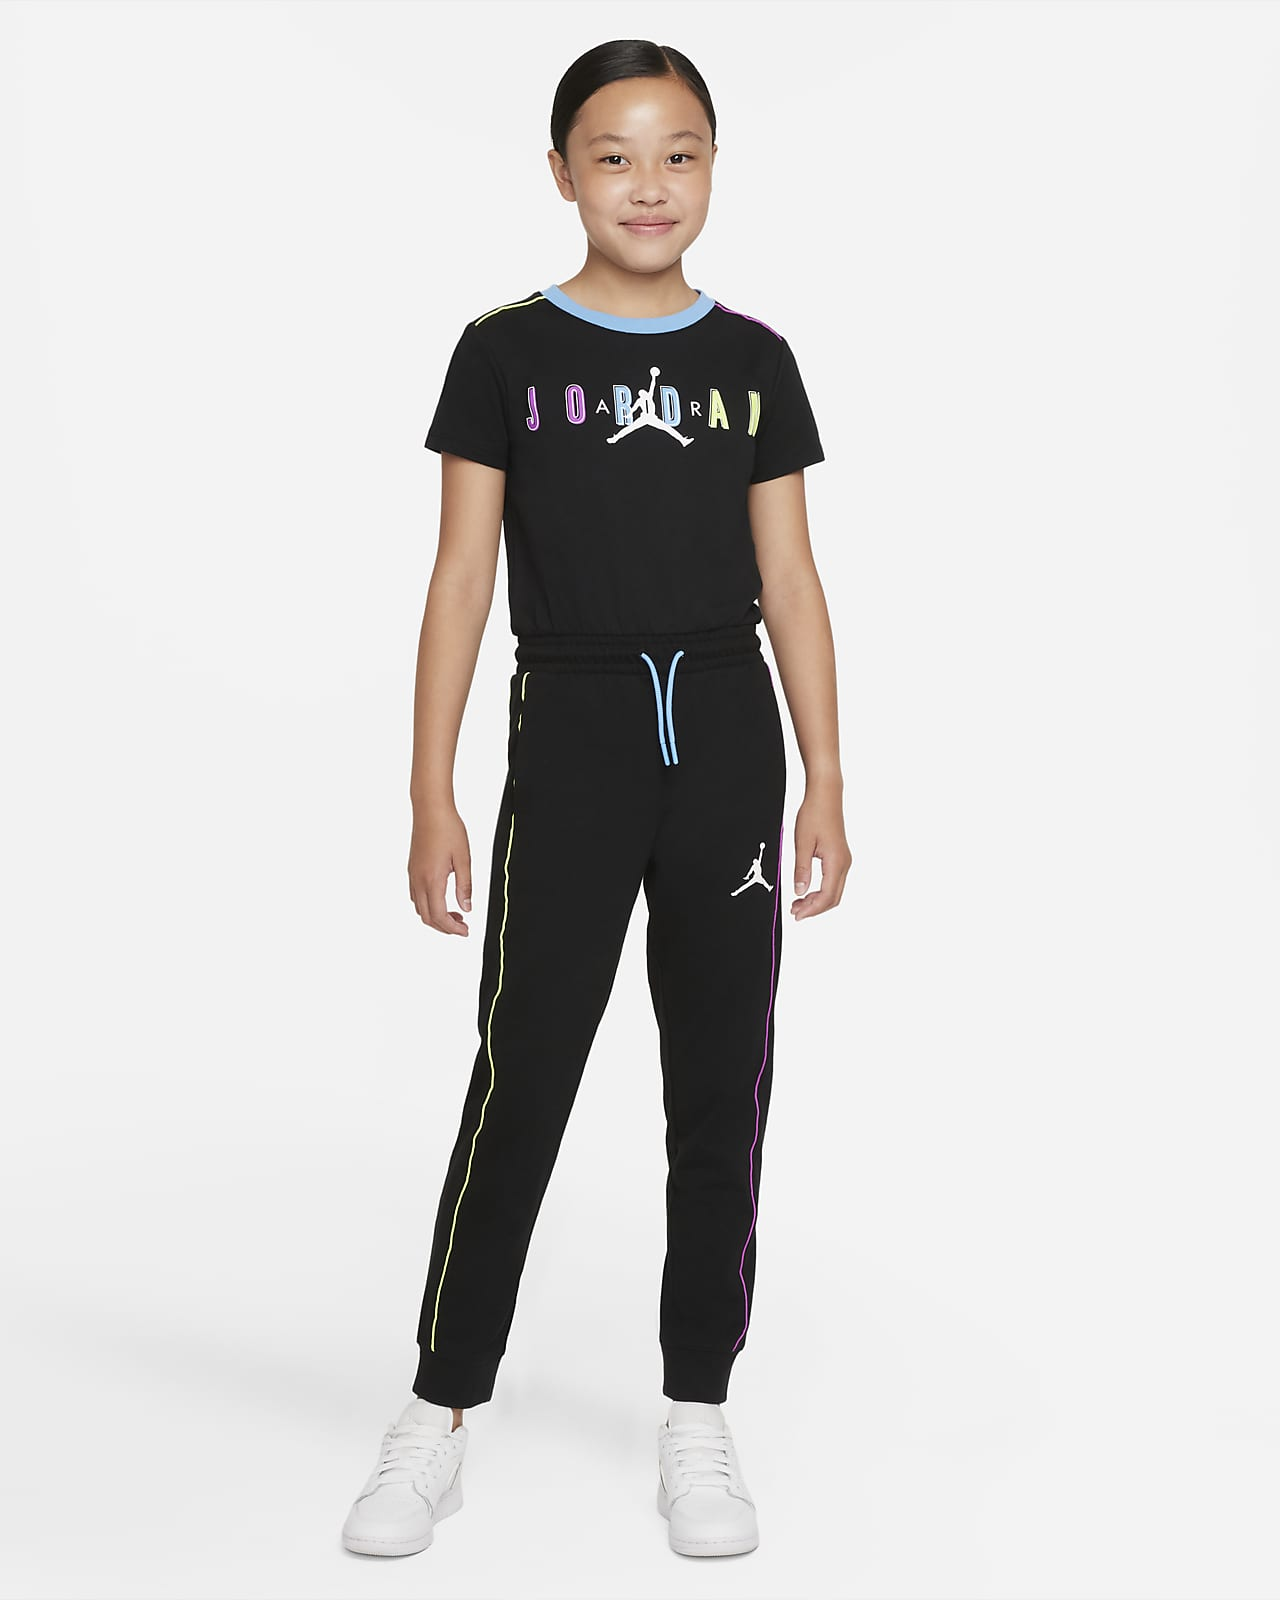 Jordan Older Kids' (Girls') Jumpsuit